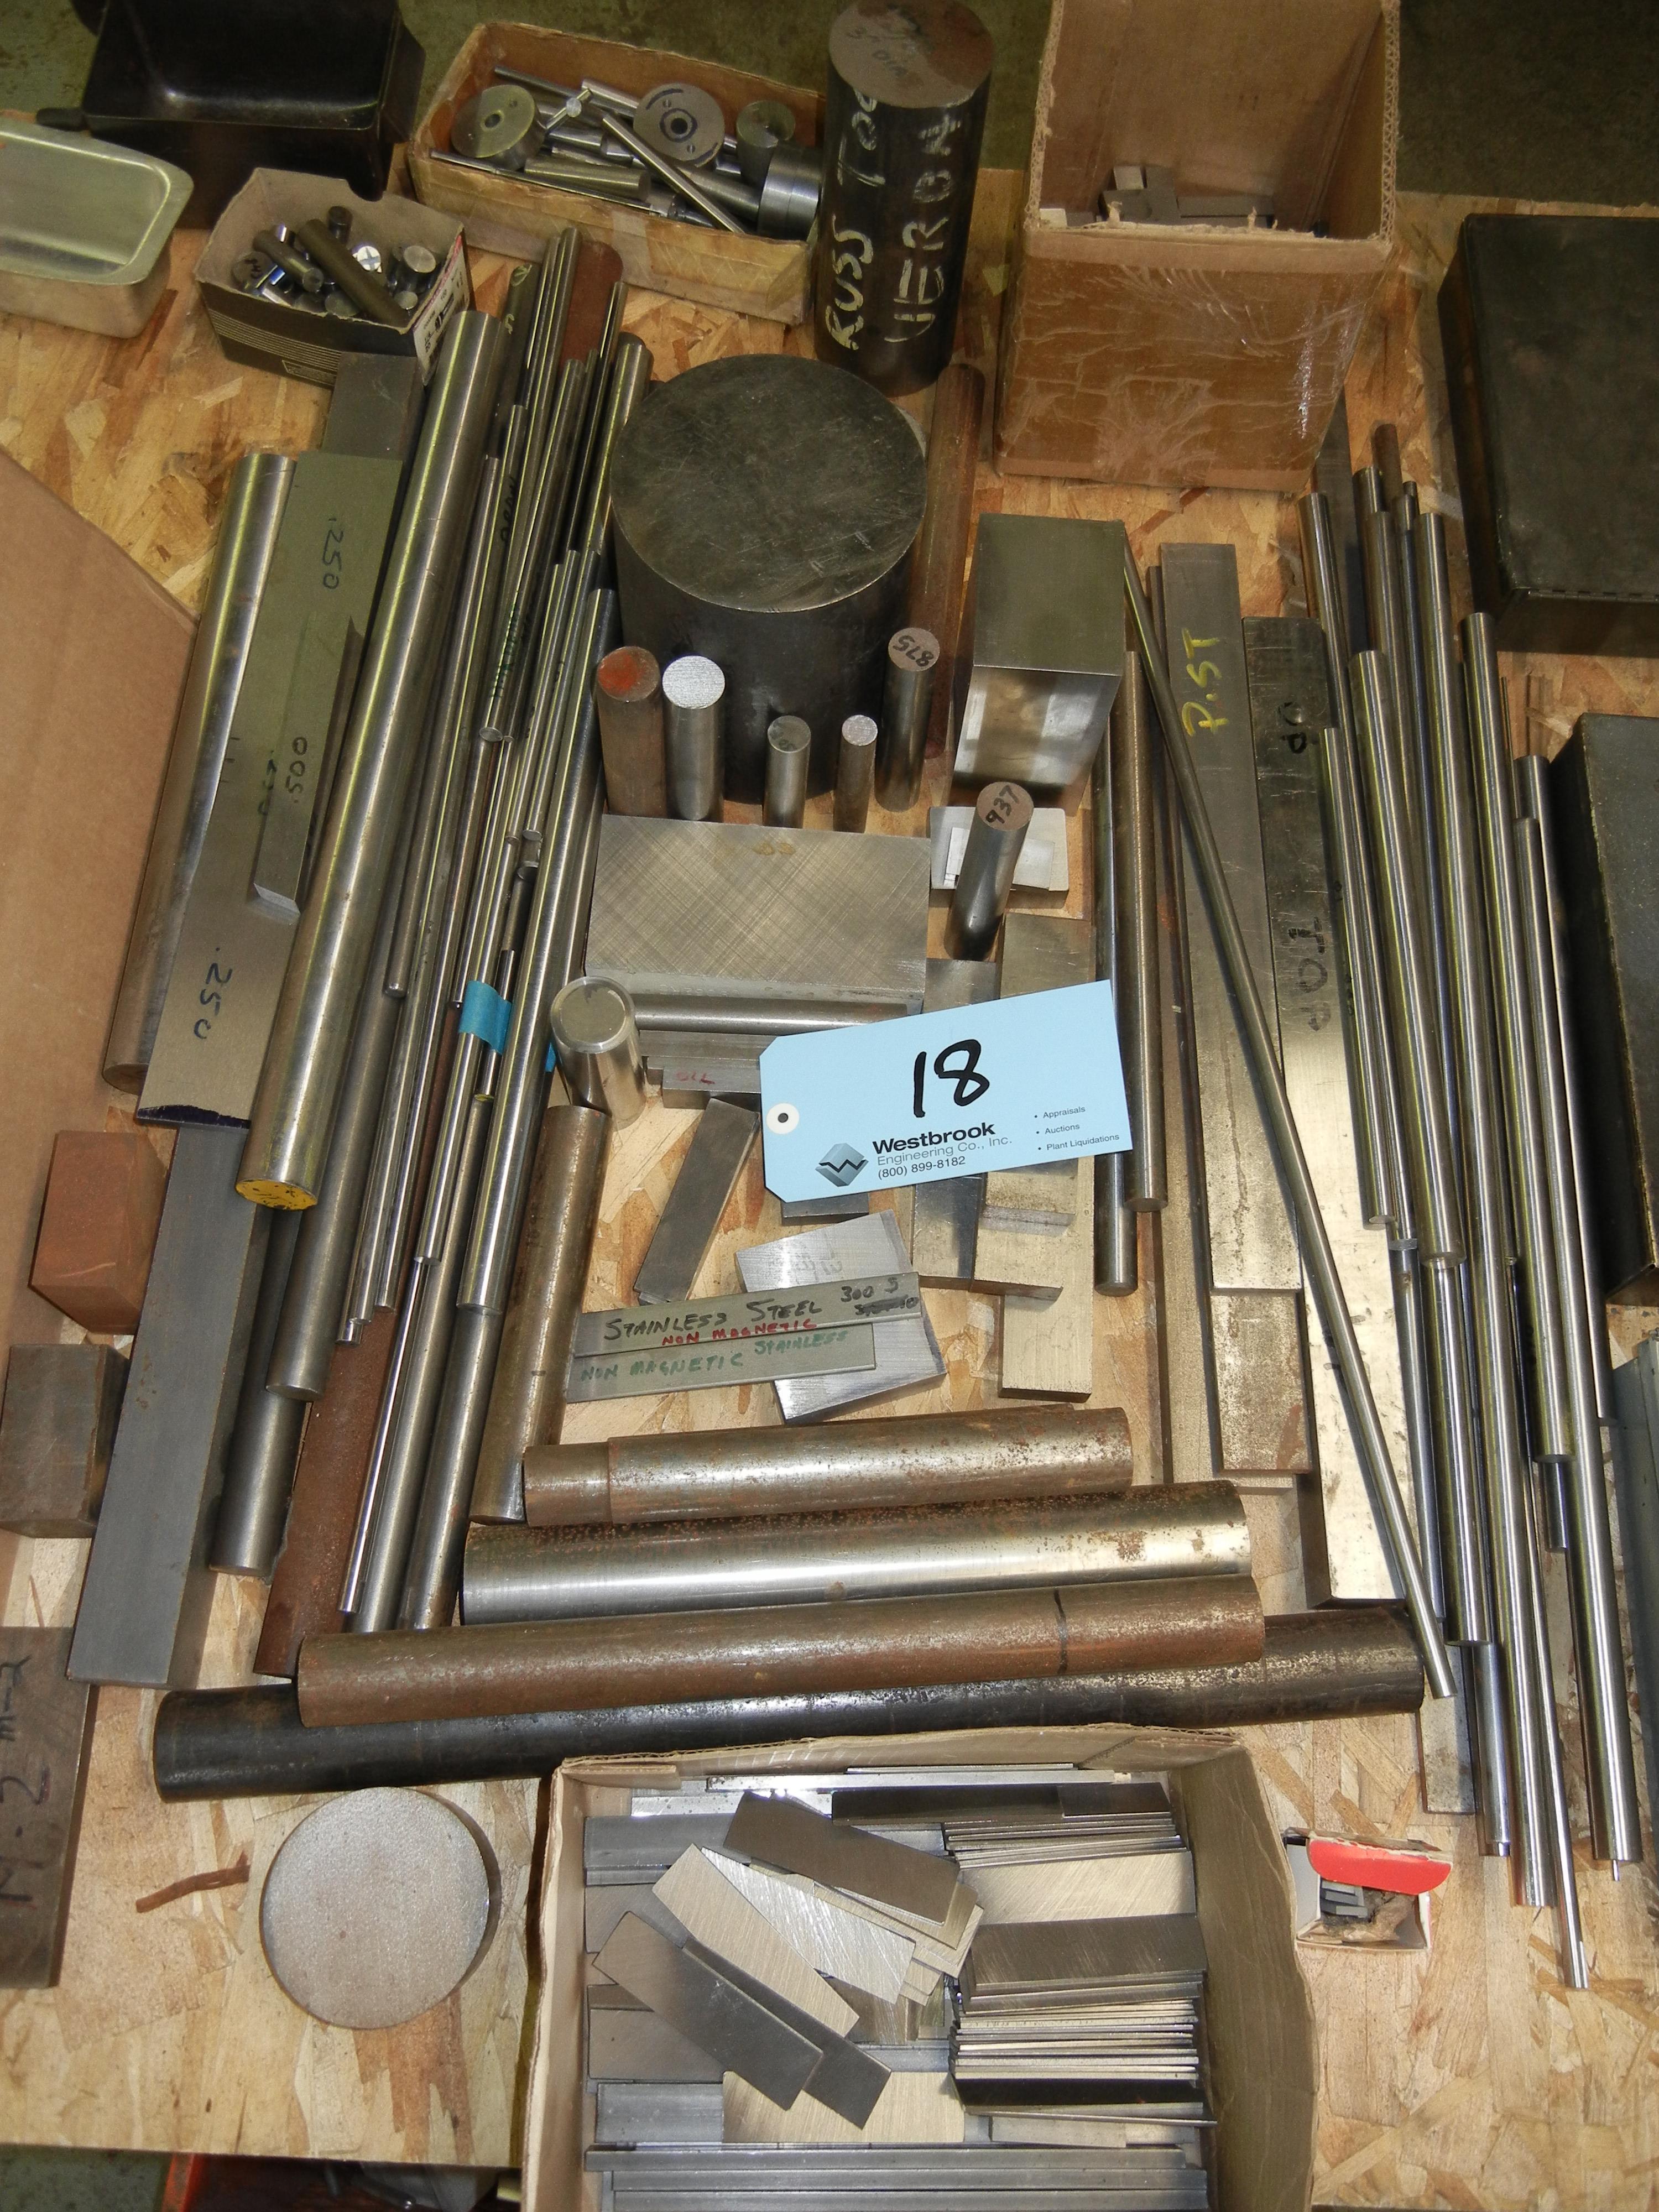 Assortment of tool steel